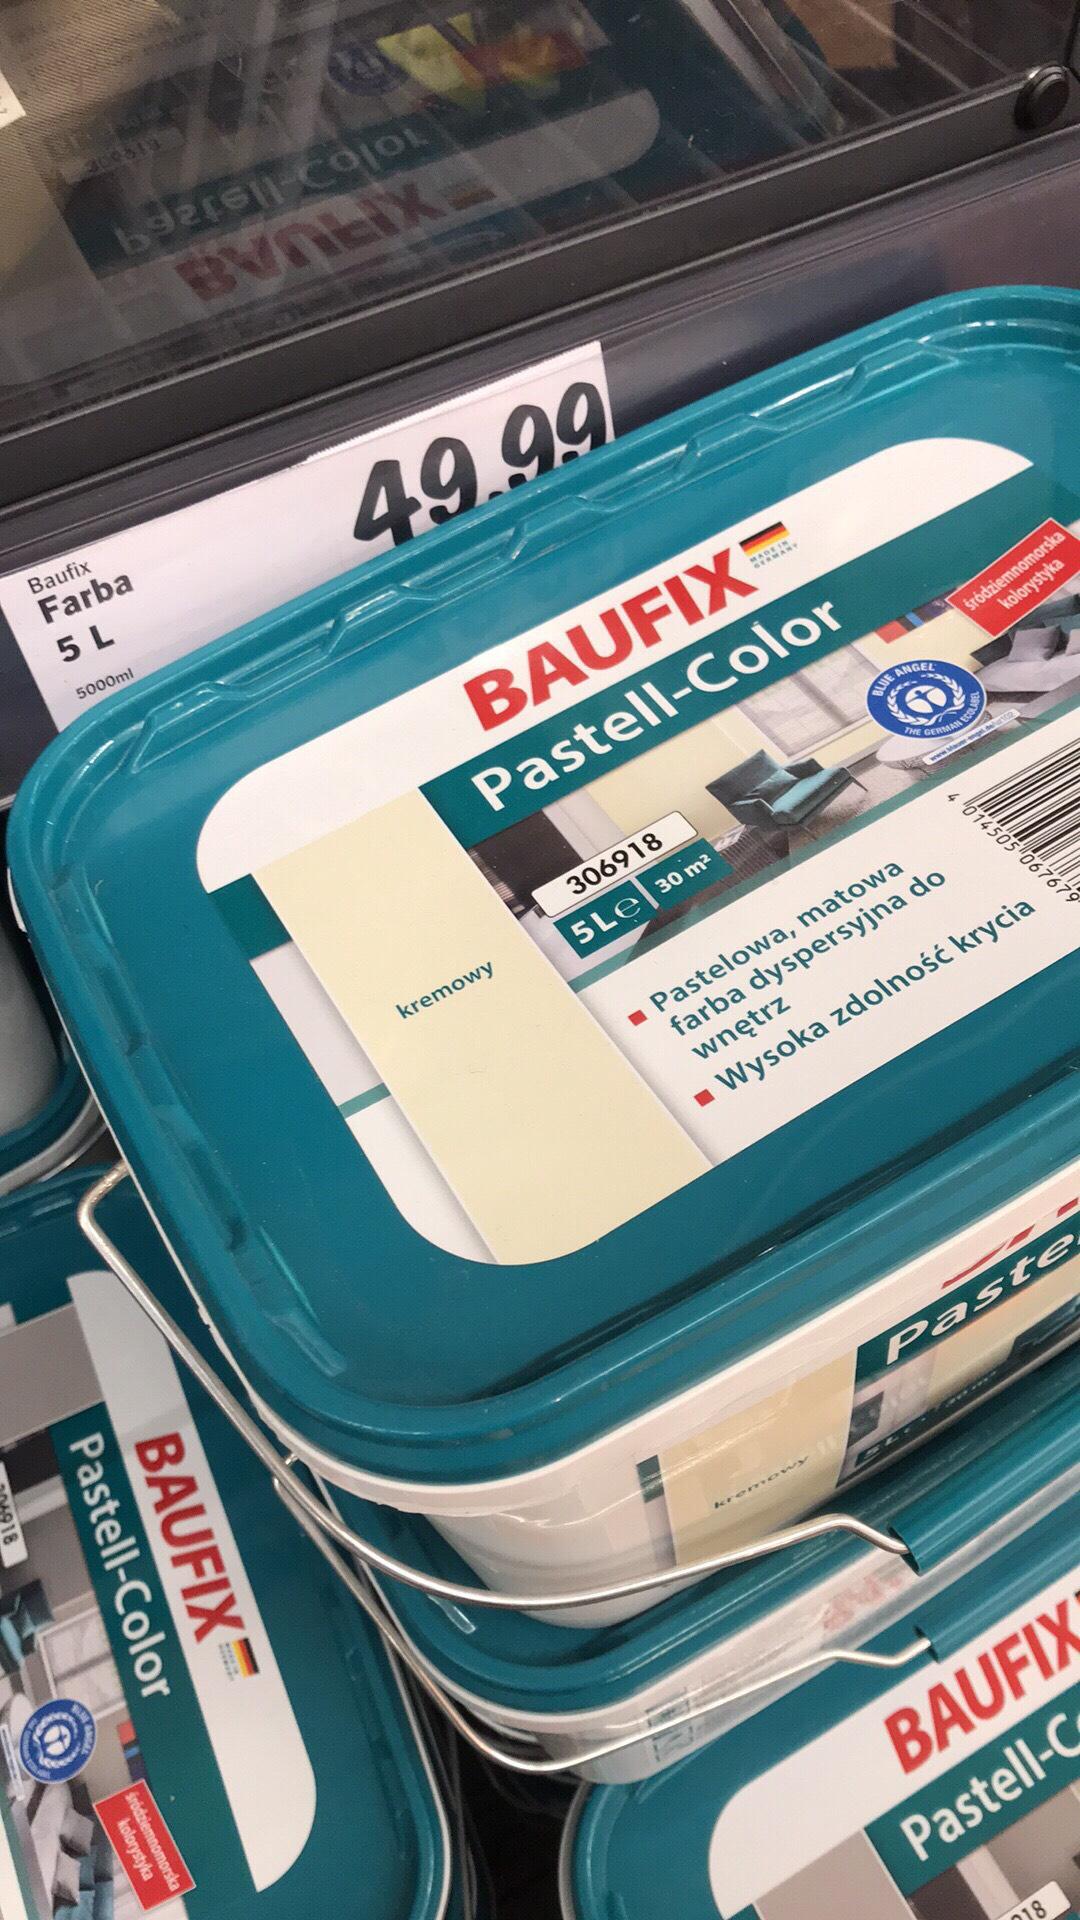 LIDL - Farba Baufix Pastell Color 5L